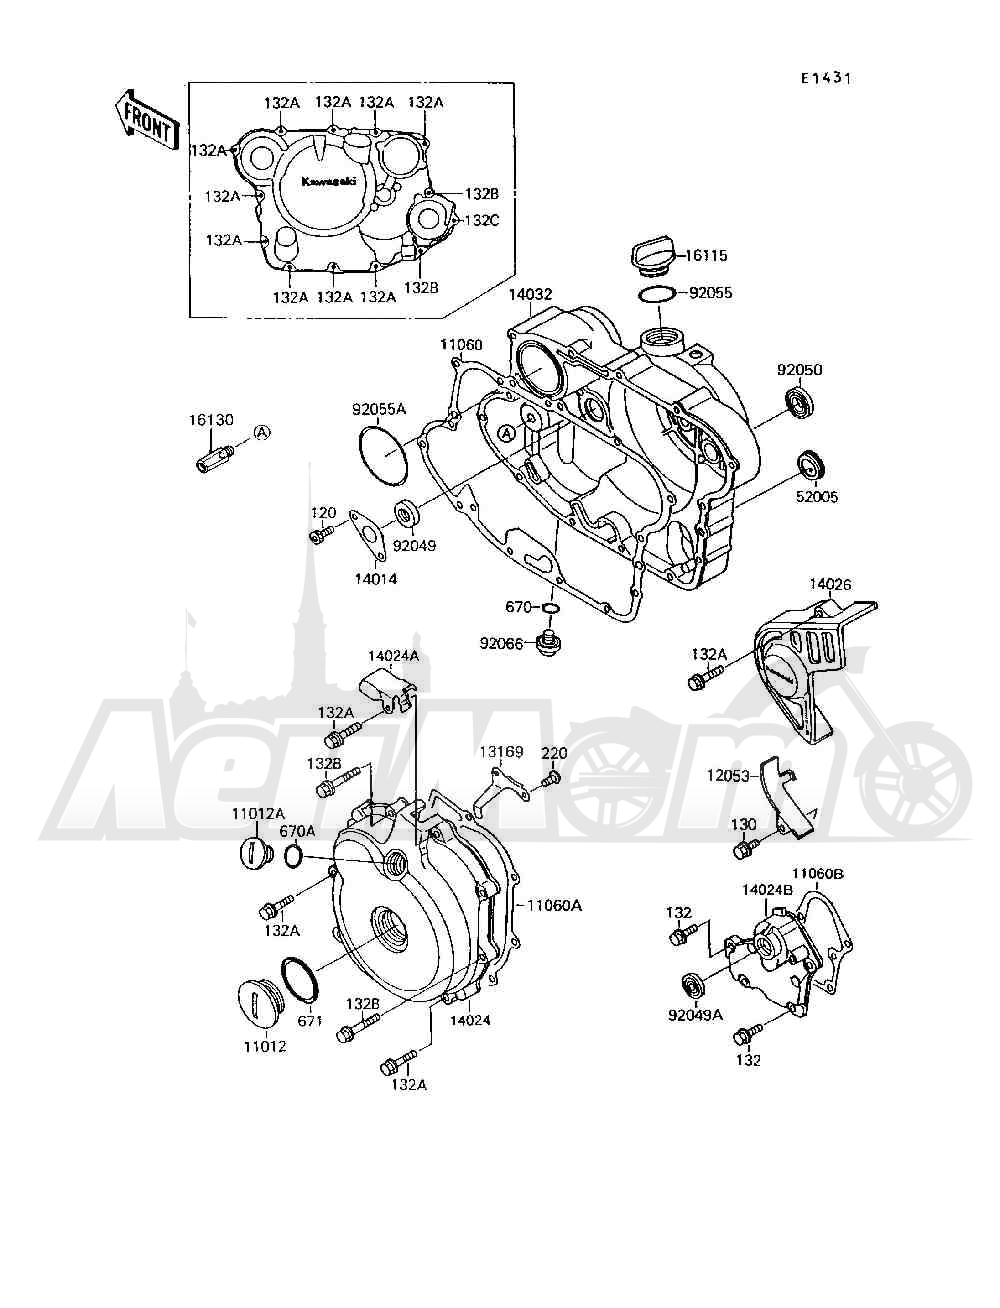 Запчасти для Квадроцикла Kawasaki 1994 MOJAVE 250 (KSF250-A8) Раздел: ENGINE COVER(S) | крышка двигателя (S)